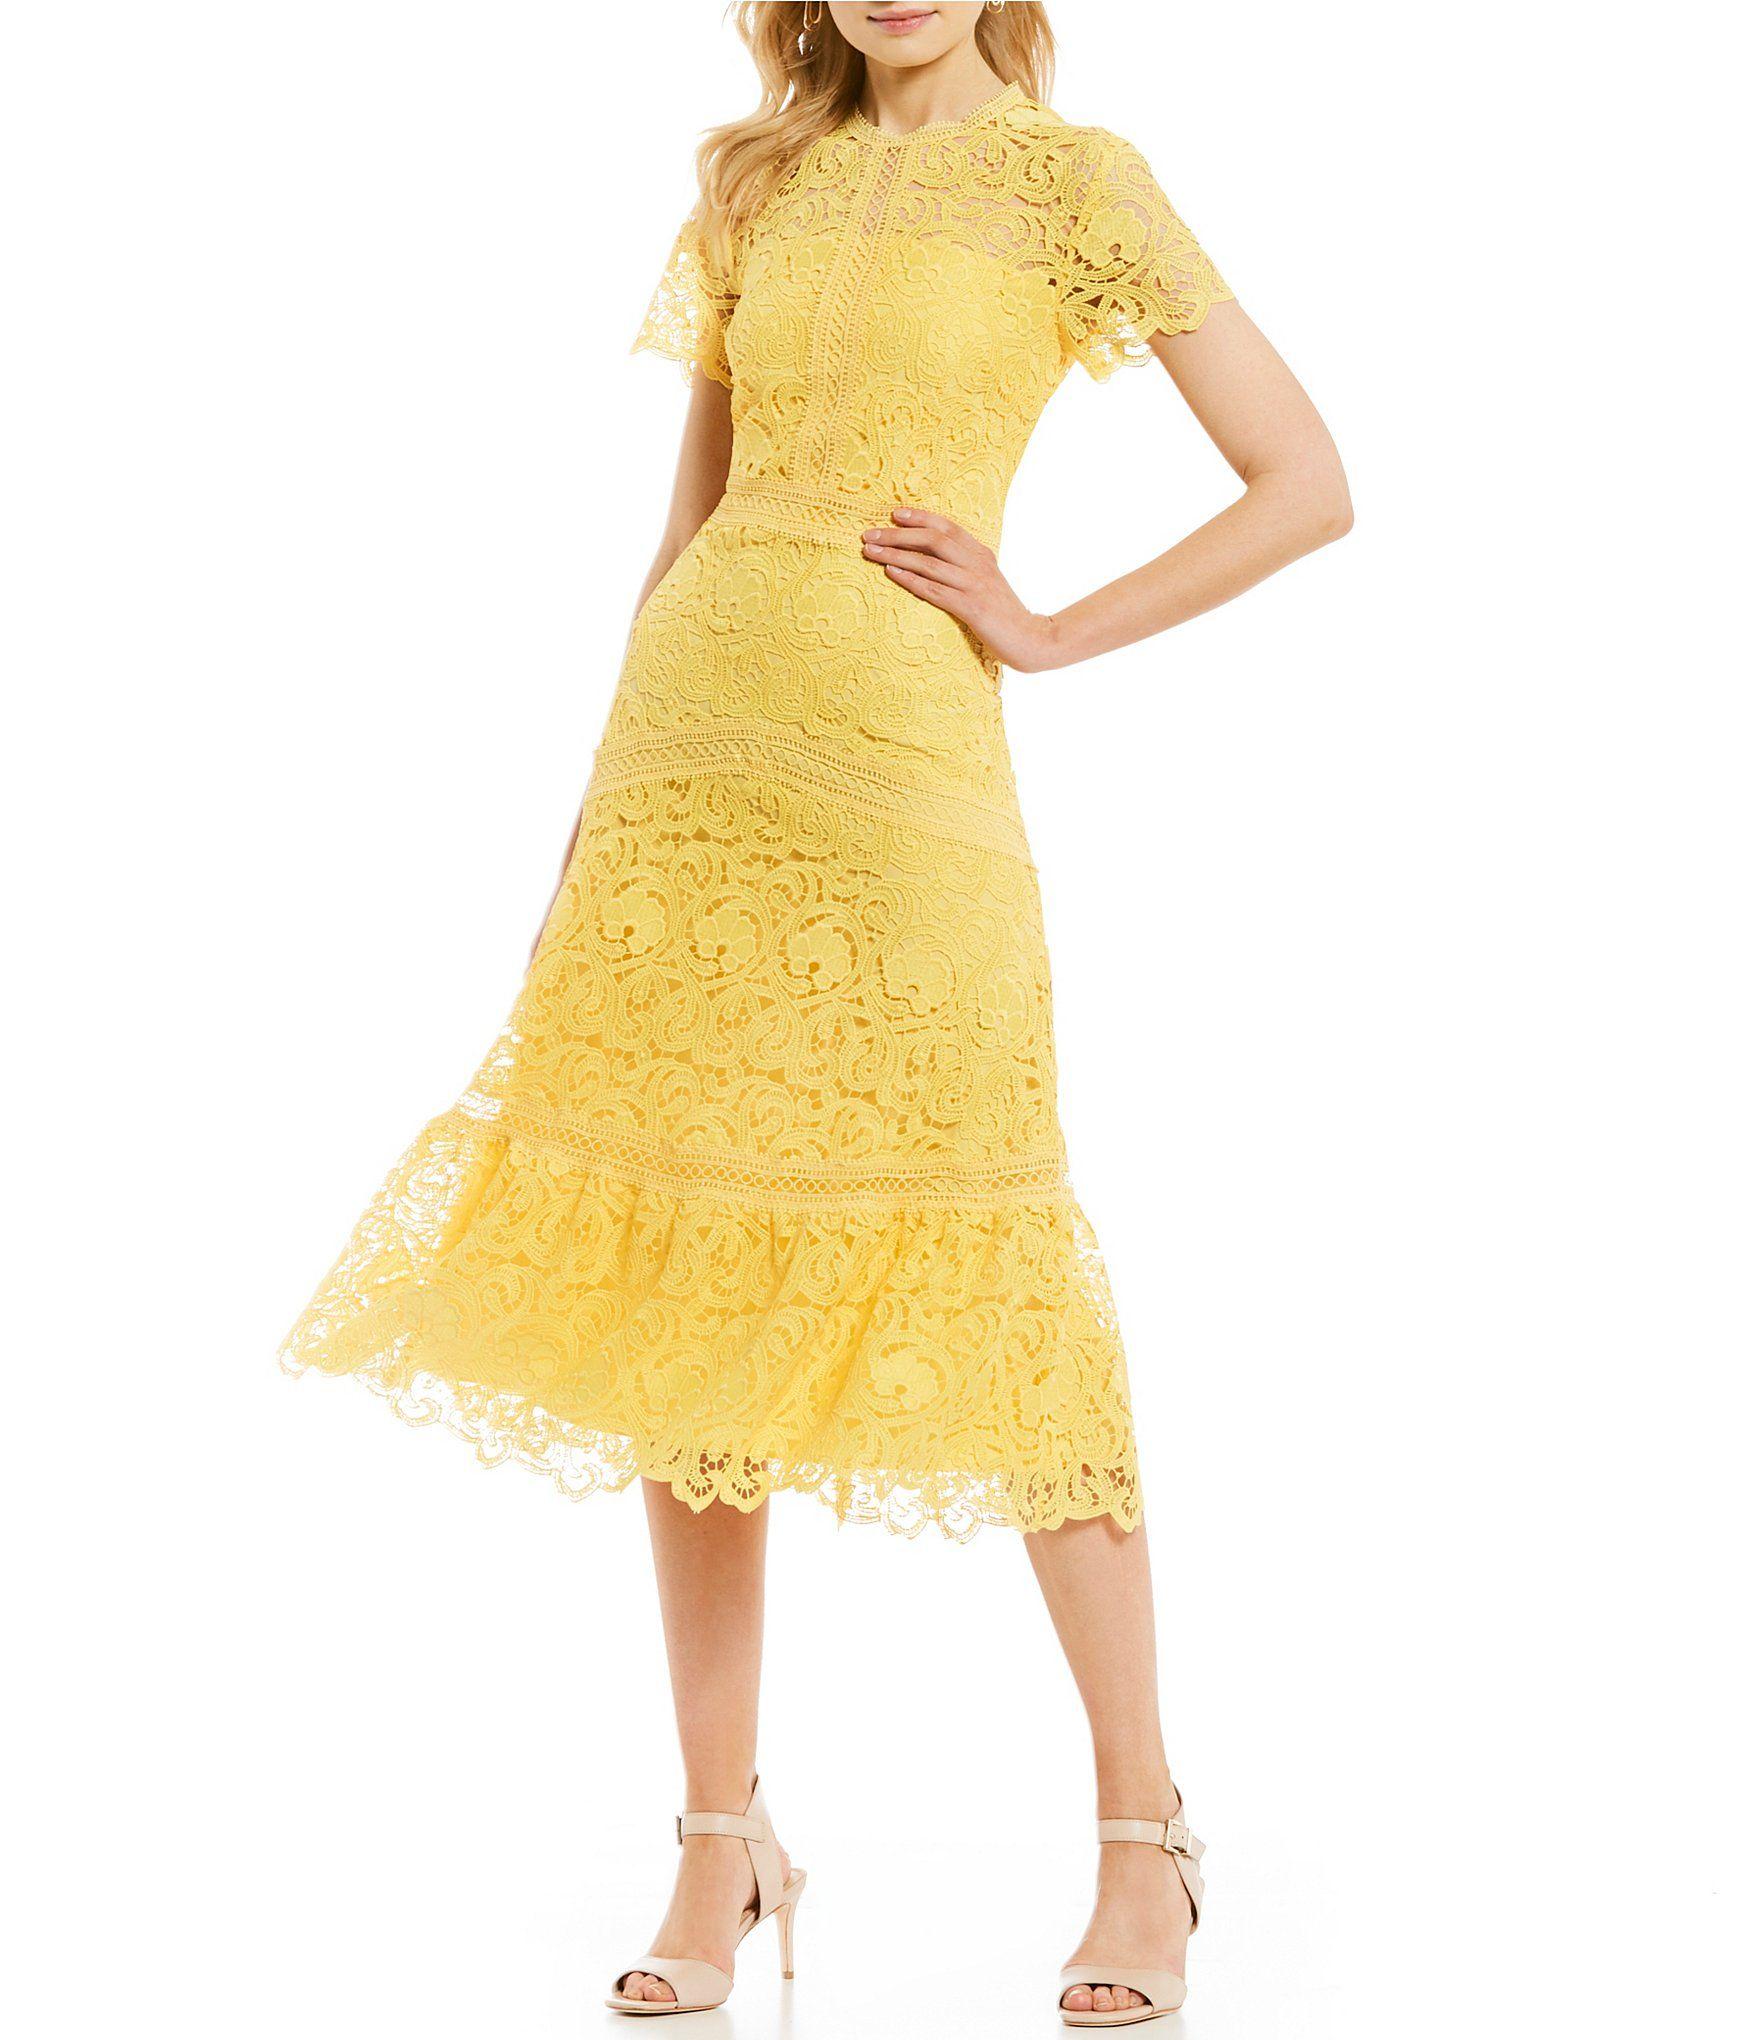 d43e9dd836bb1 Shop for Antonio Melani Lexi Lace Flounce Hem A-Line Midi Dress at  Dillards.com. Visit Dillards.com to find clothing, accessories, shoes,  cosmetics & more.